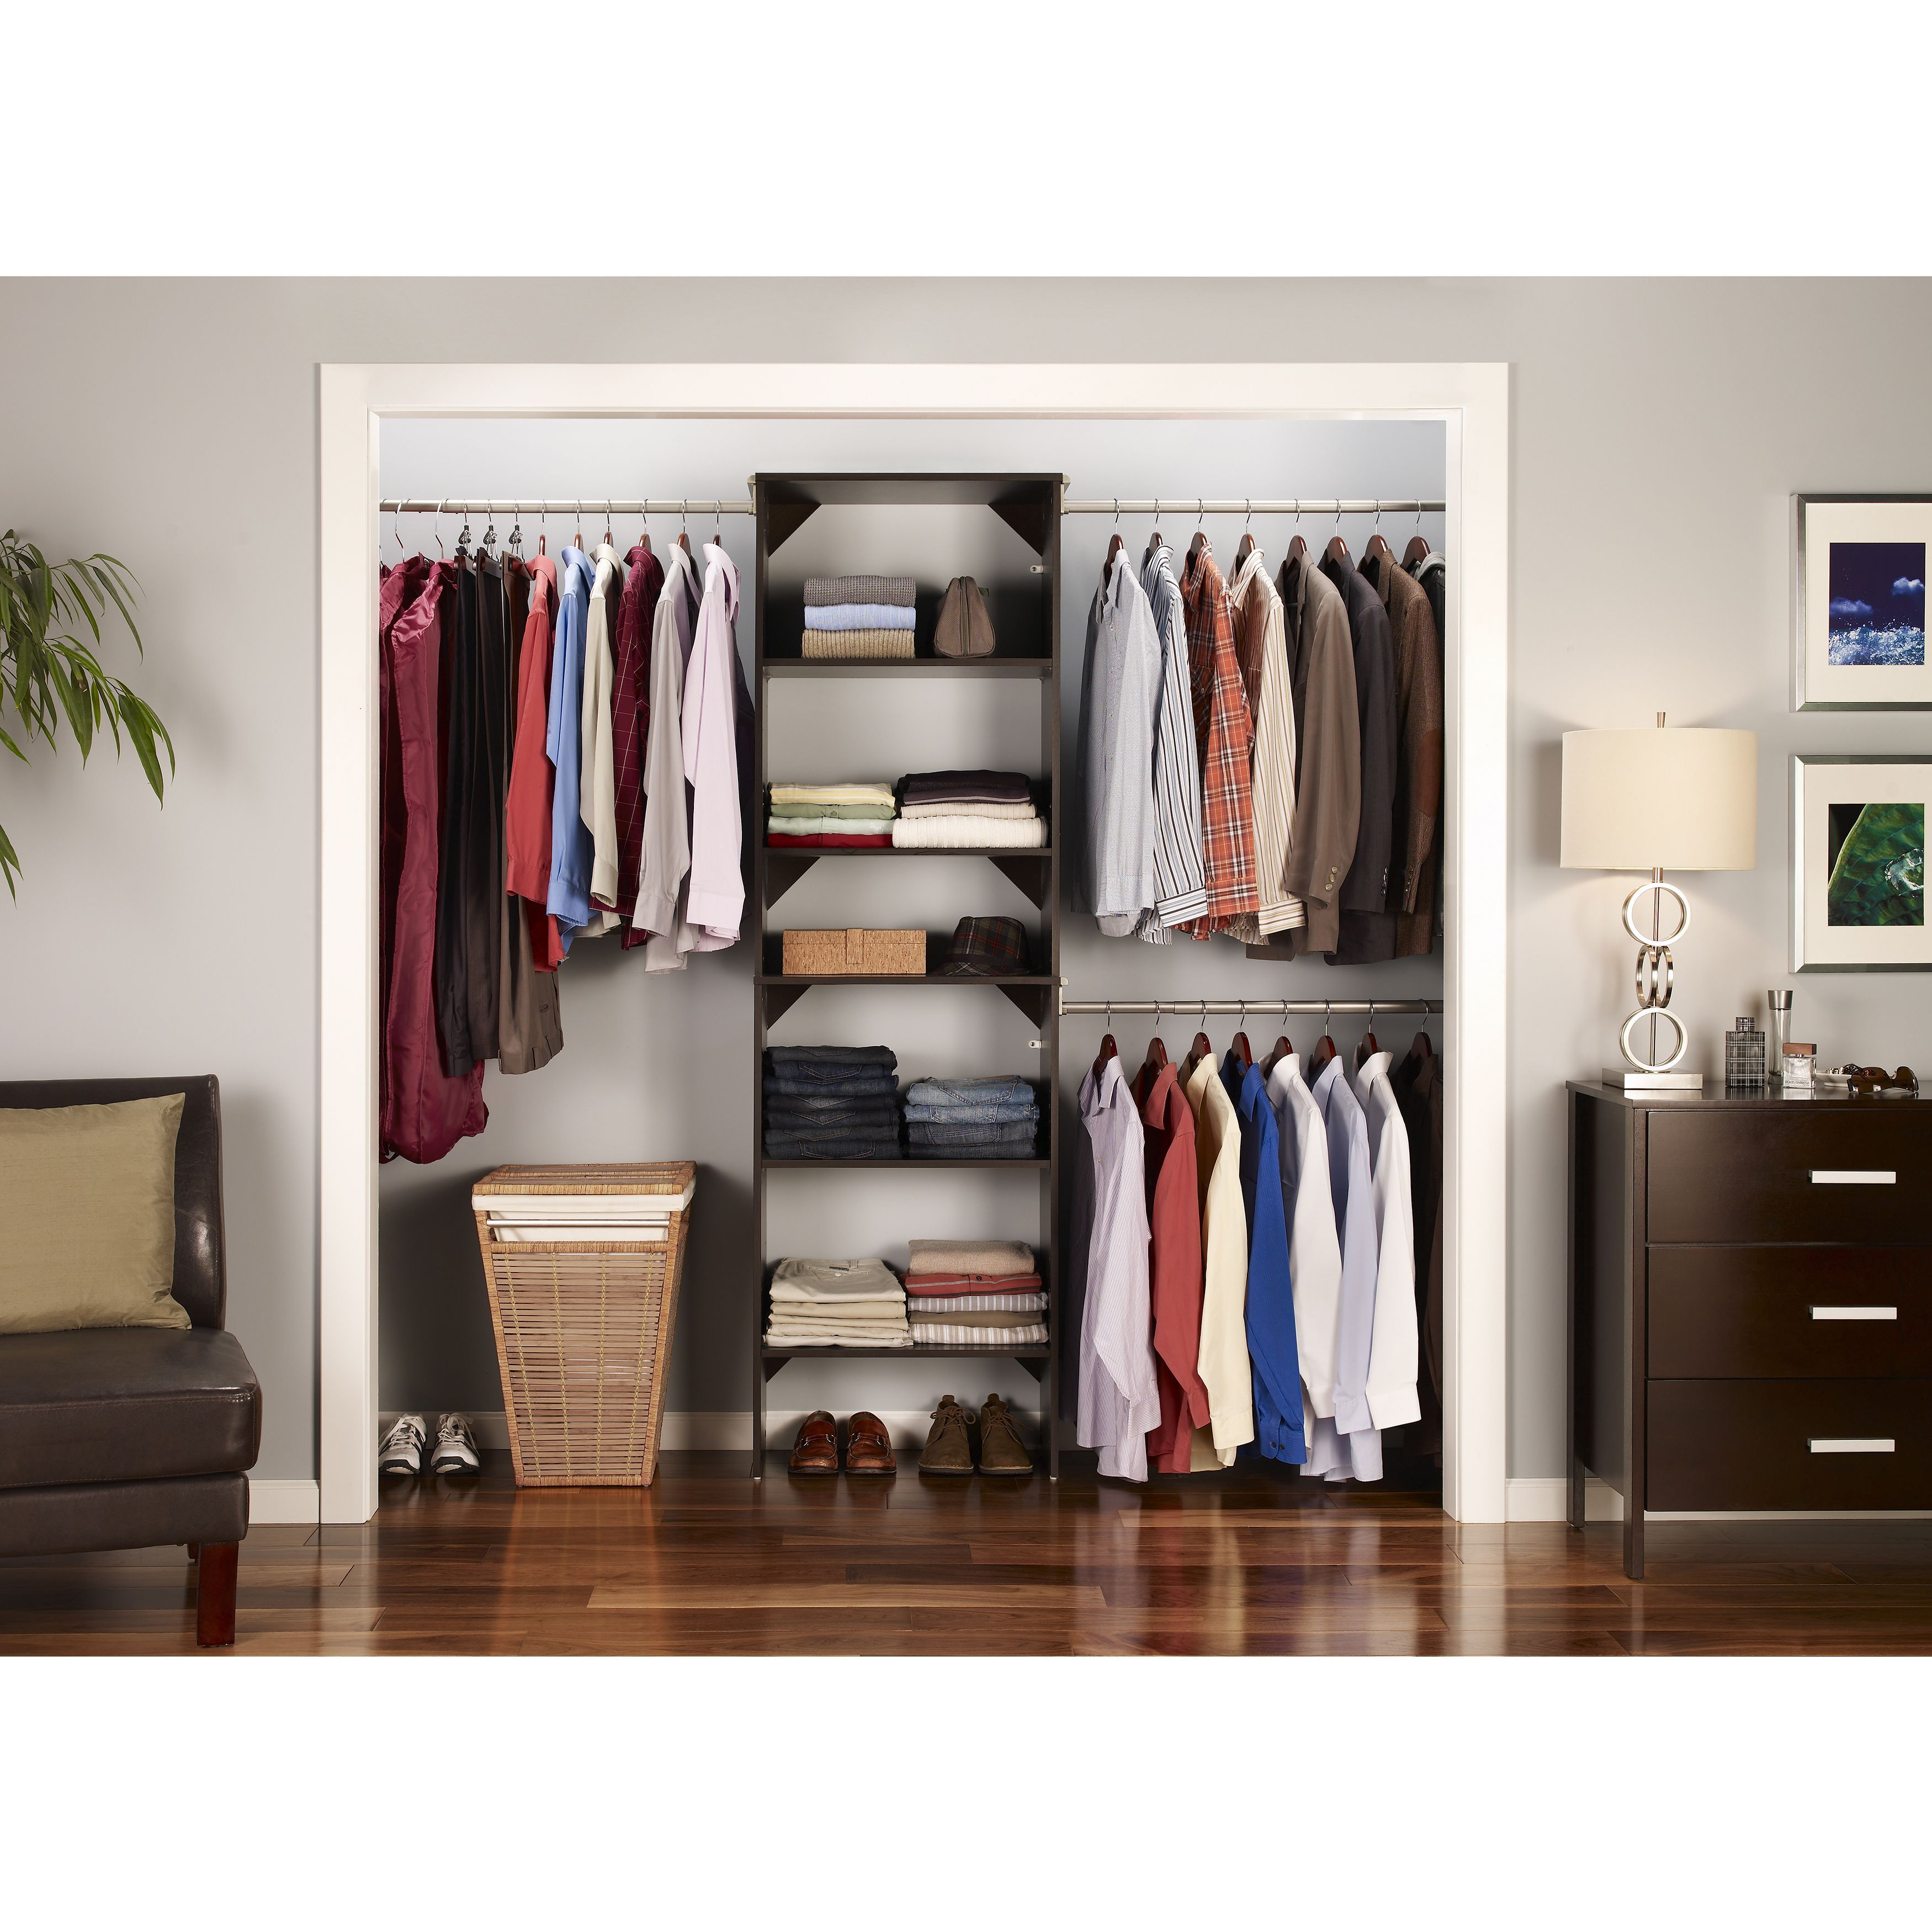 Overstock Com Online Shopping Bedding Furniture Electronics Jewelry Clothing More Closet System Closetmaid Closet Organizer Kits